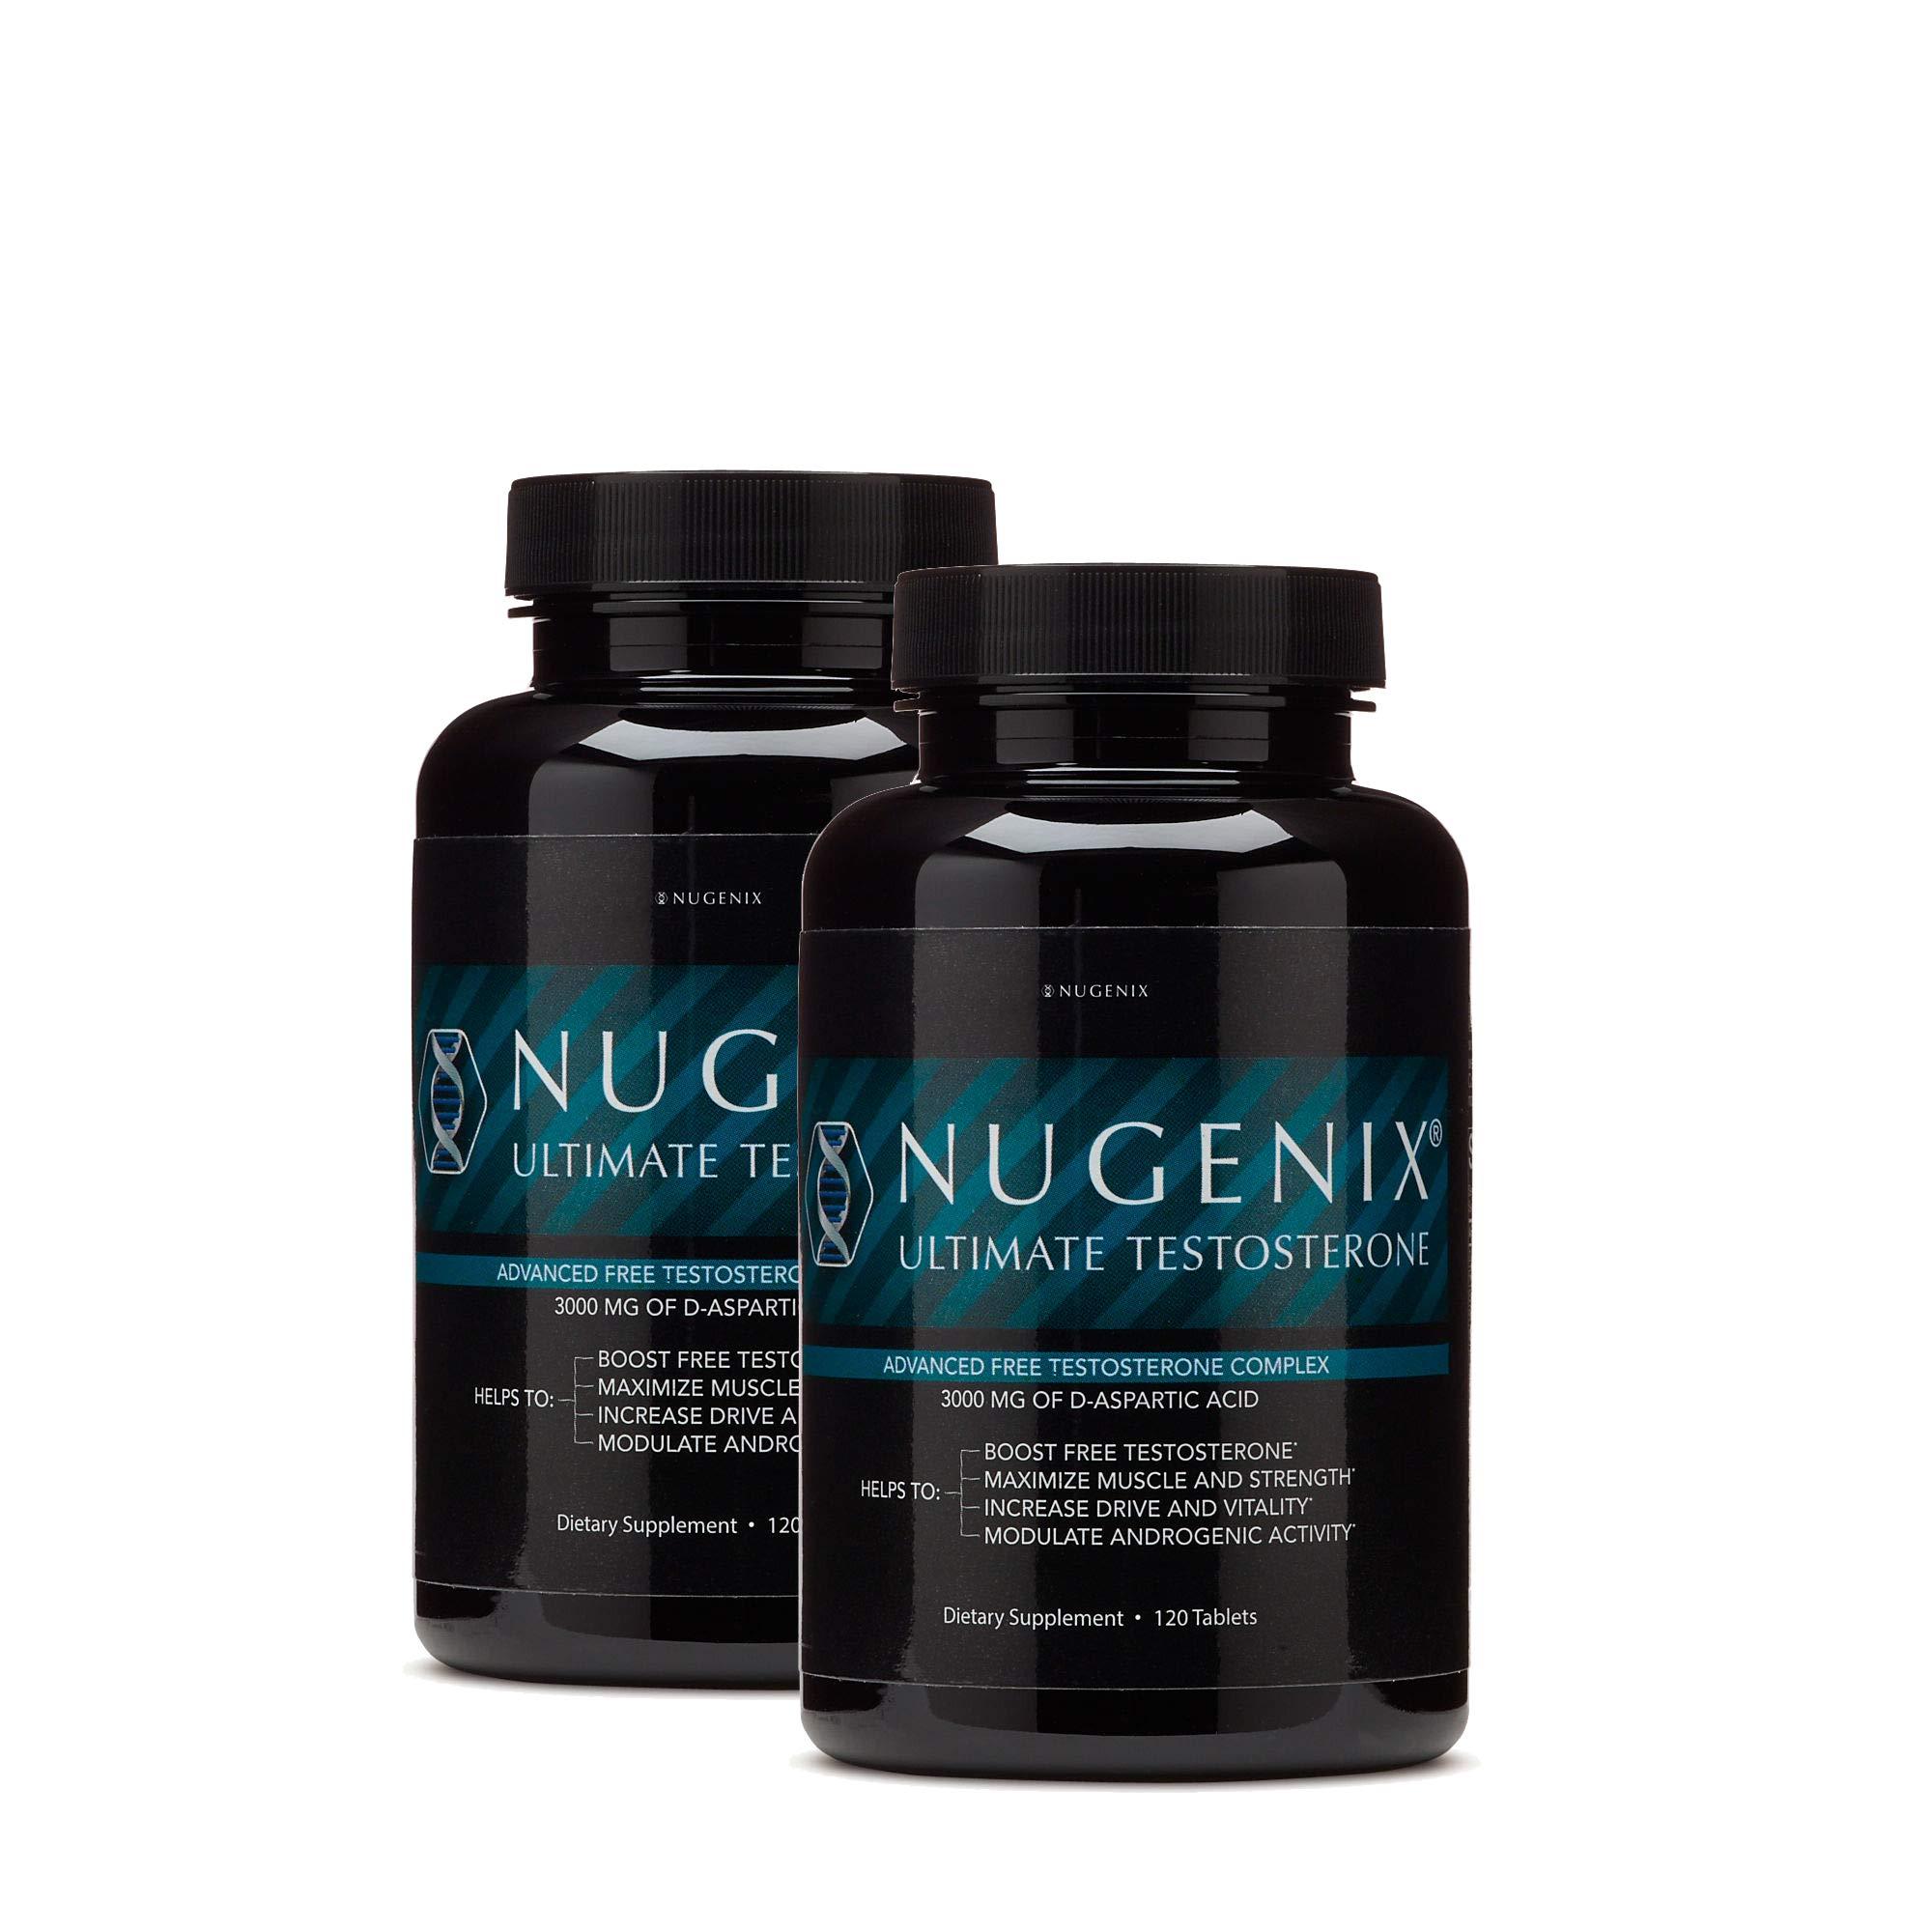 Nugenix Ultimate Testosterone - Twin Pack